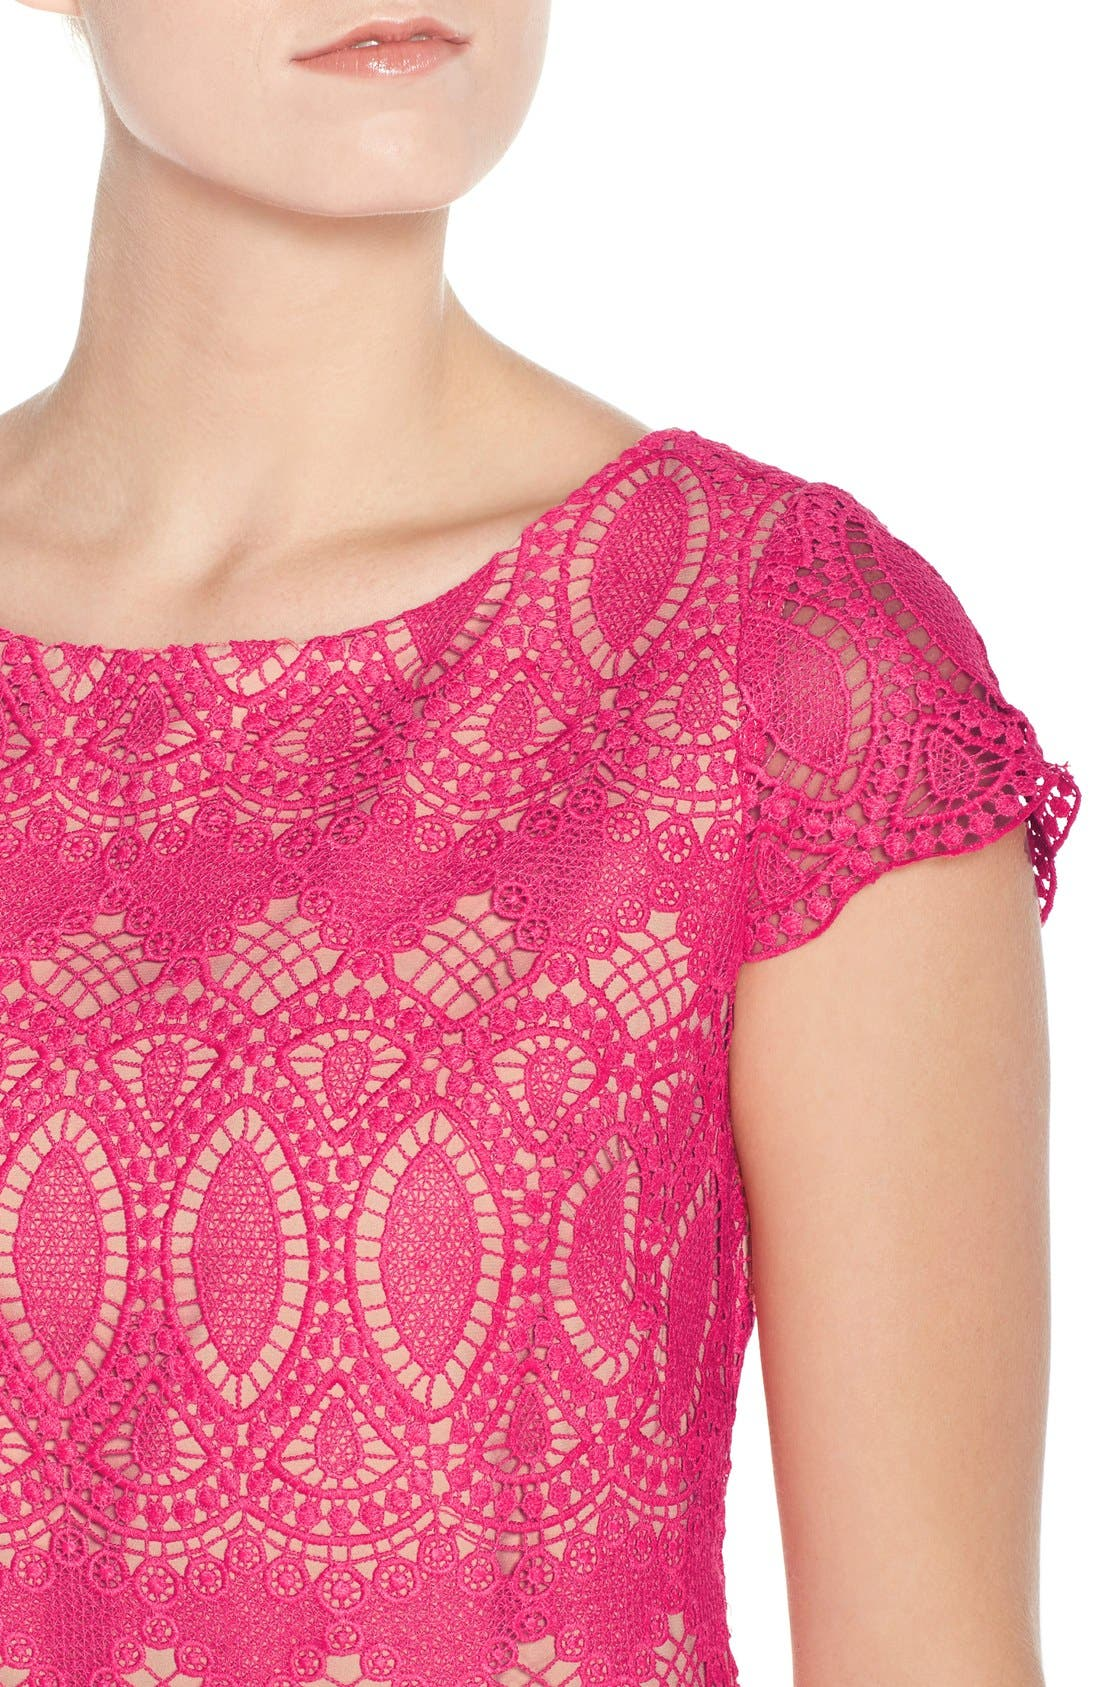 Scalloped Lace Sheath Dress,                             Alternate thumbnail 6, color,                             660